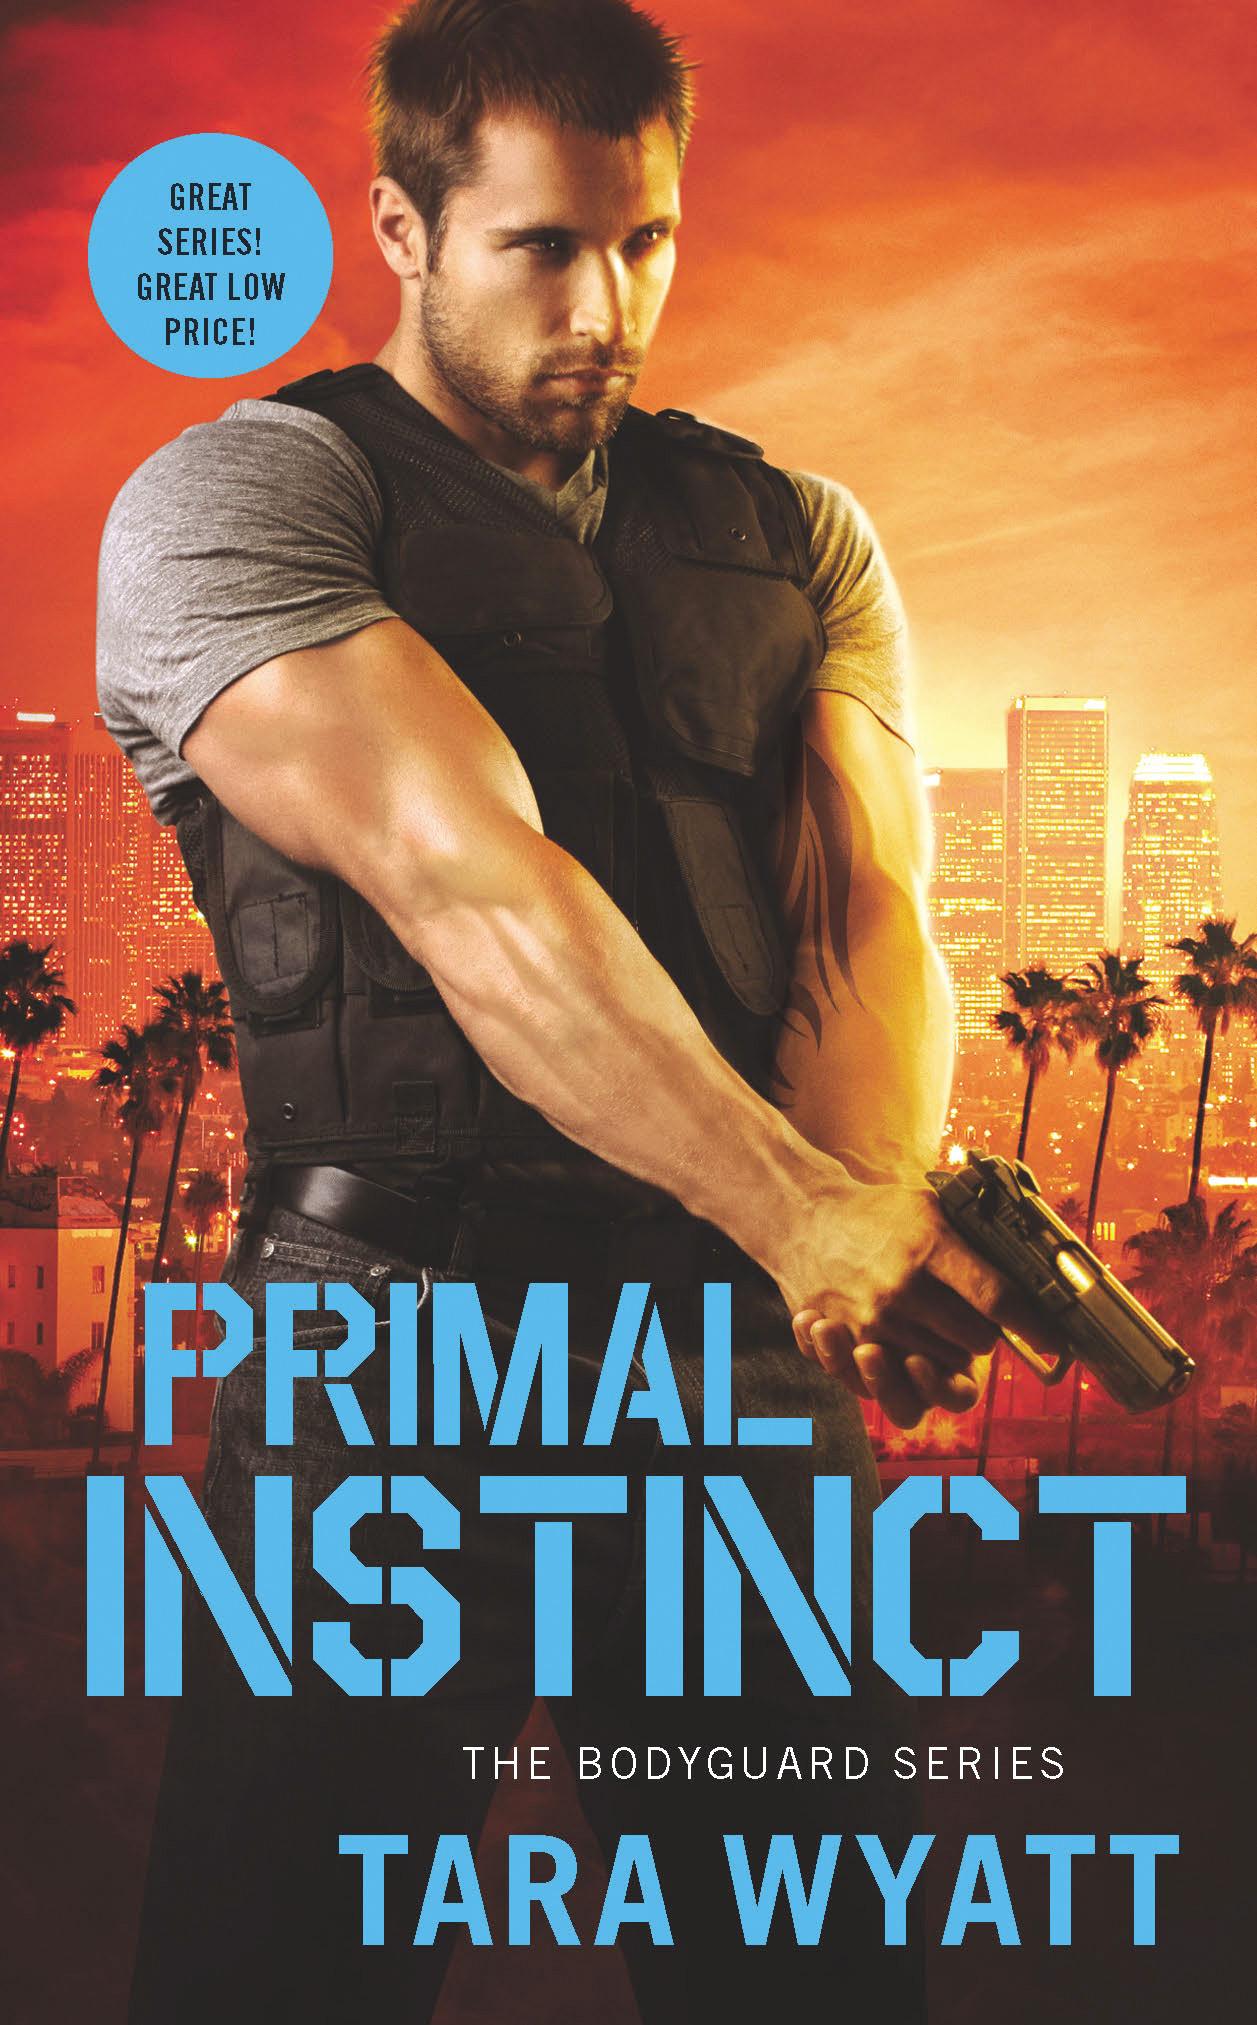 Primal Instinct by Tara Wyatt The Bodyguard Series Book 2 Romantic Suspense